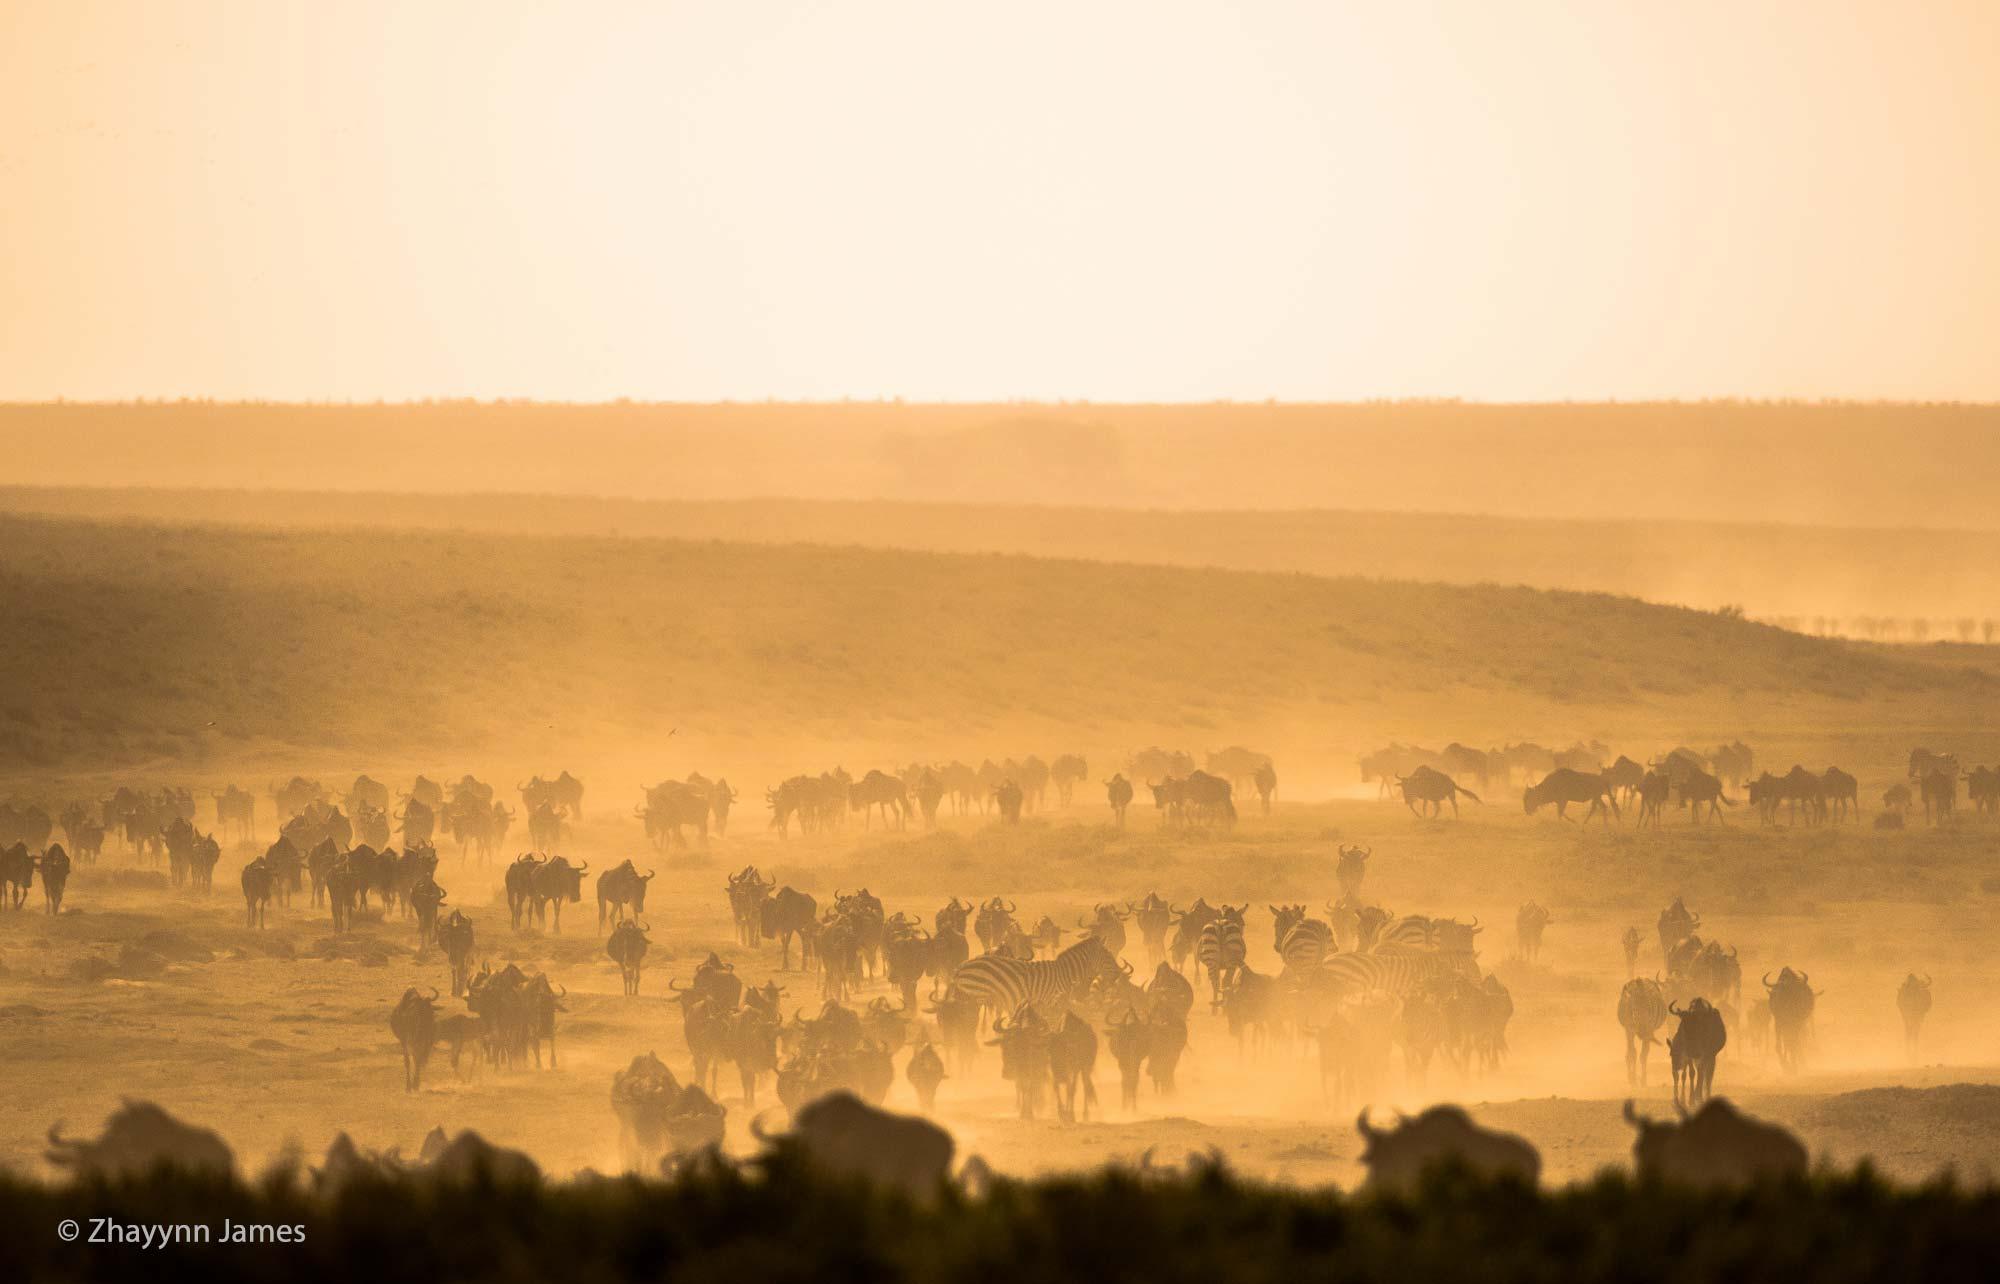 Serengeti Scape